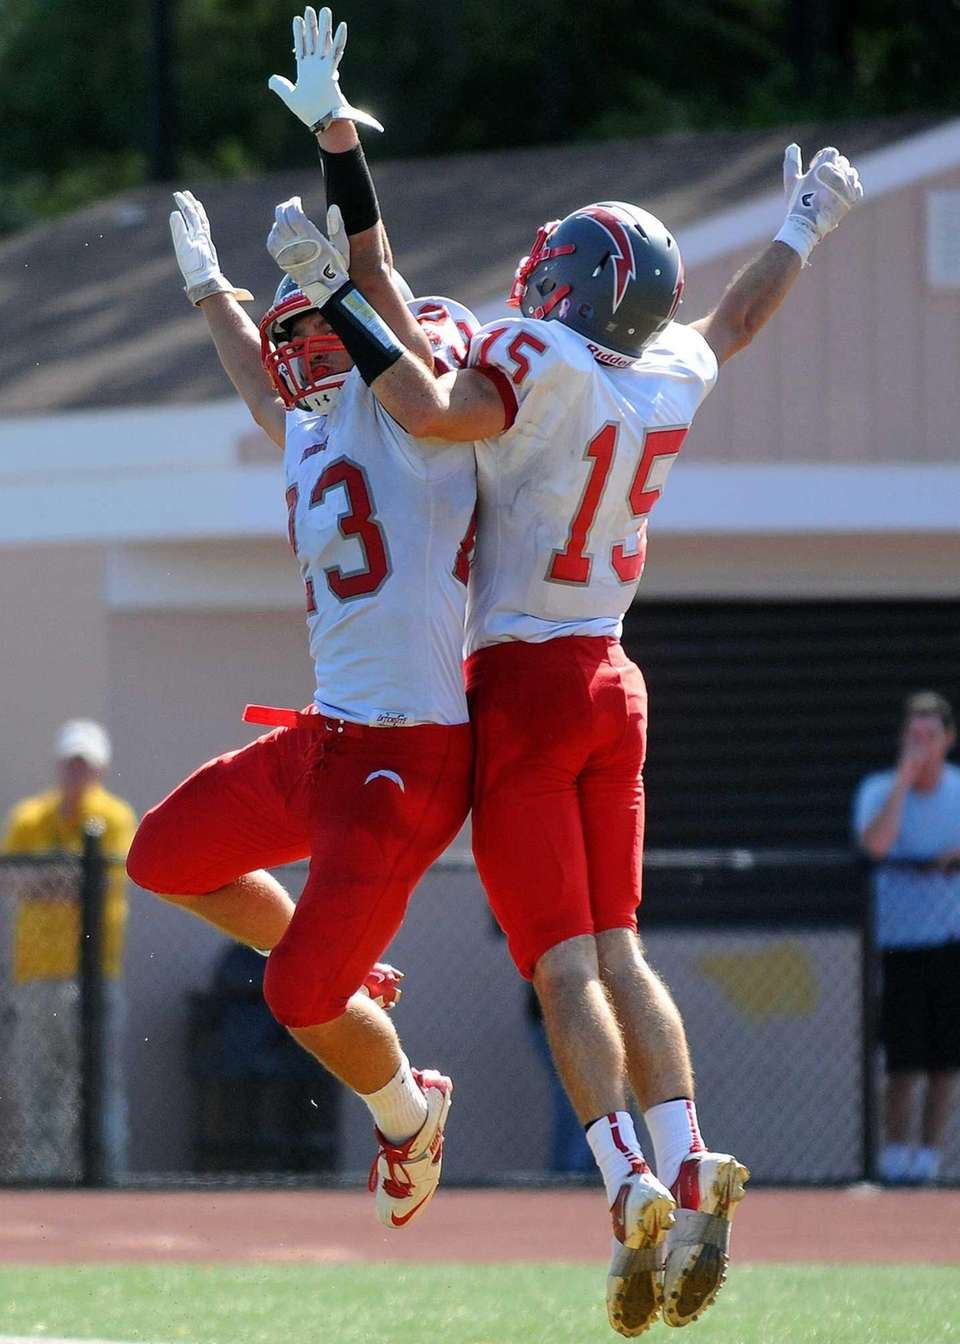 Connnetquot's Ryan Renfroe, left, celebrates with teammate James